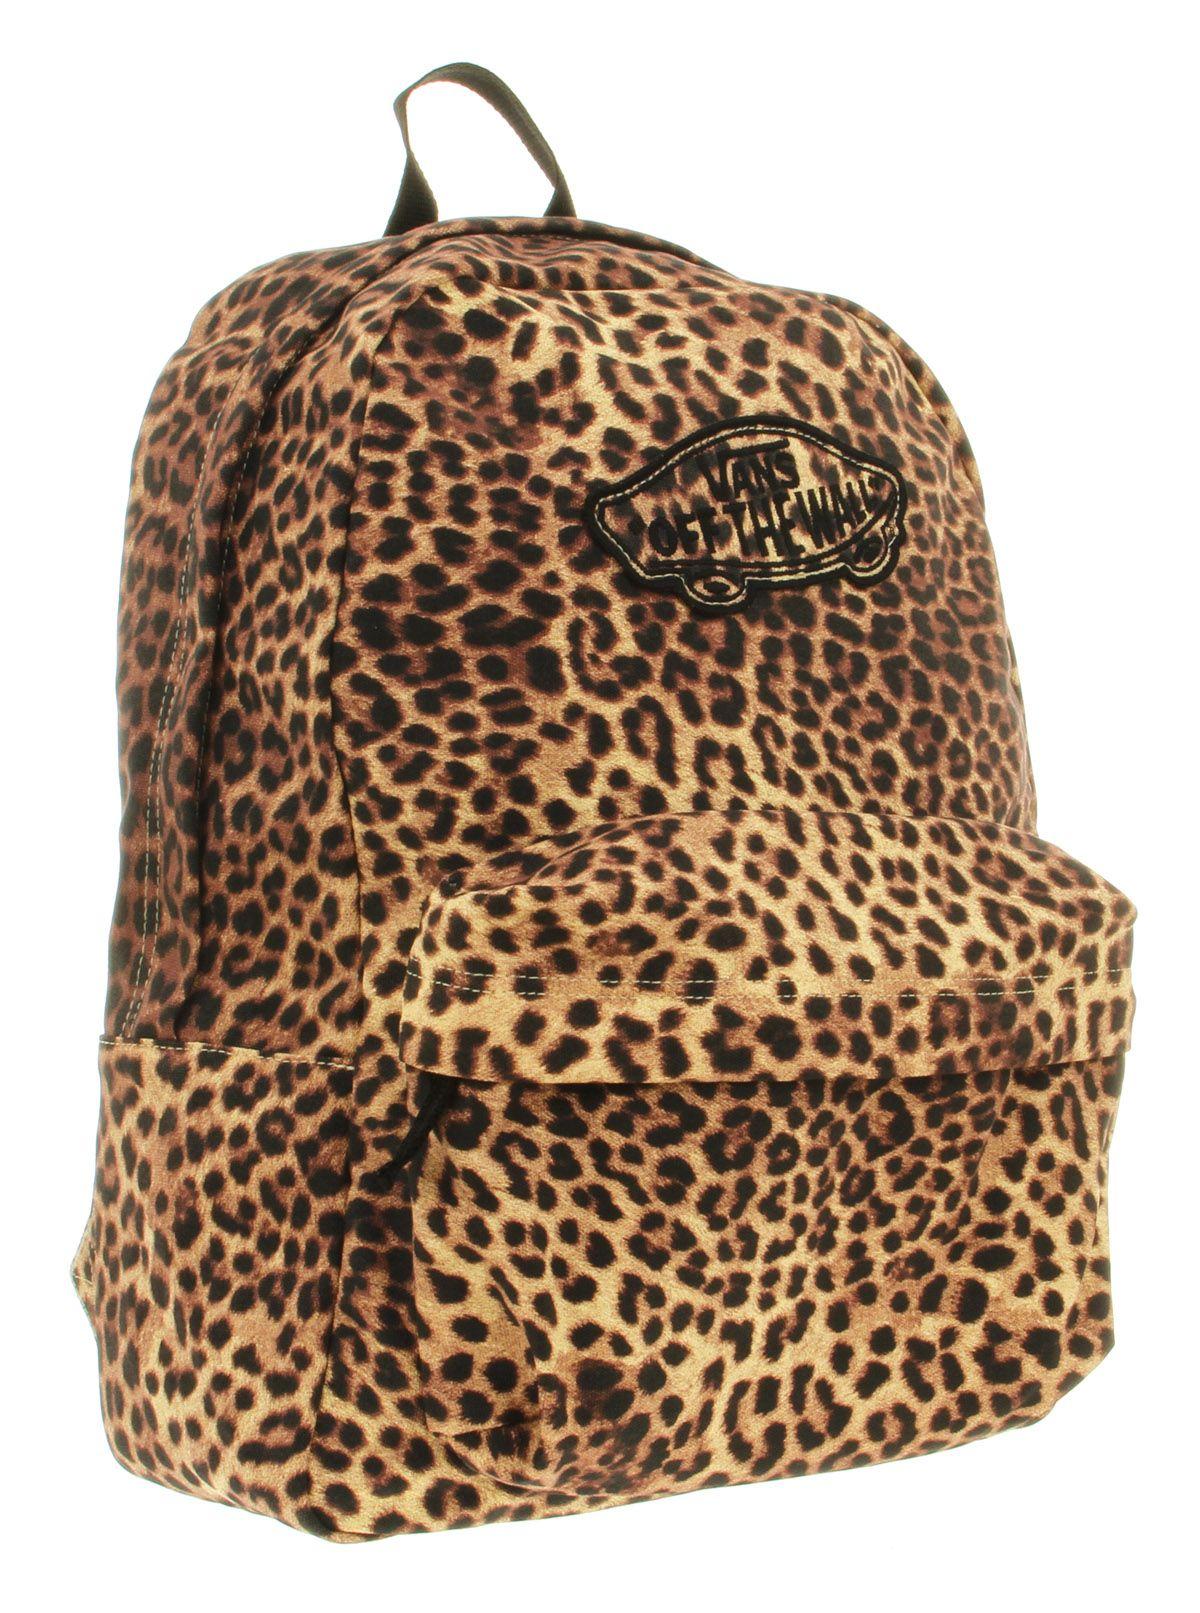 71bc08d6d1 Vans realm backpack leopard print shoes accessories sports